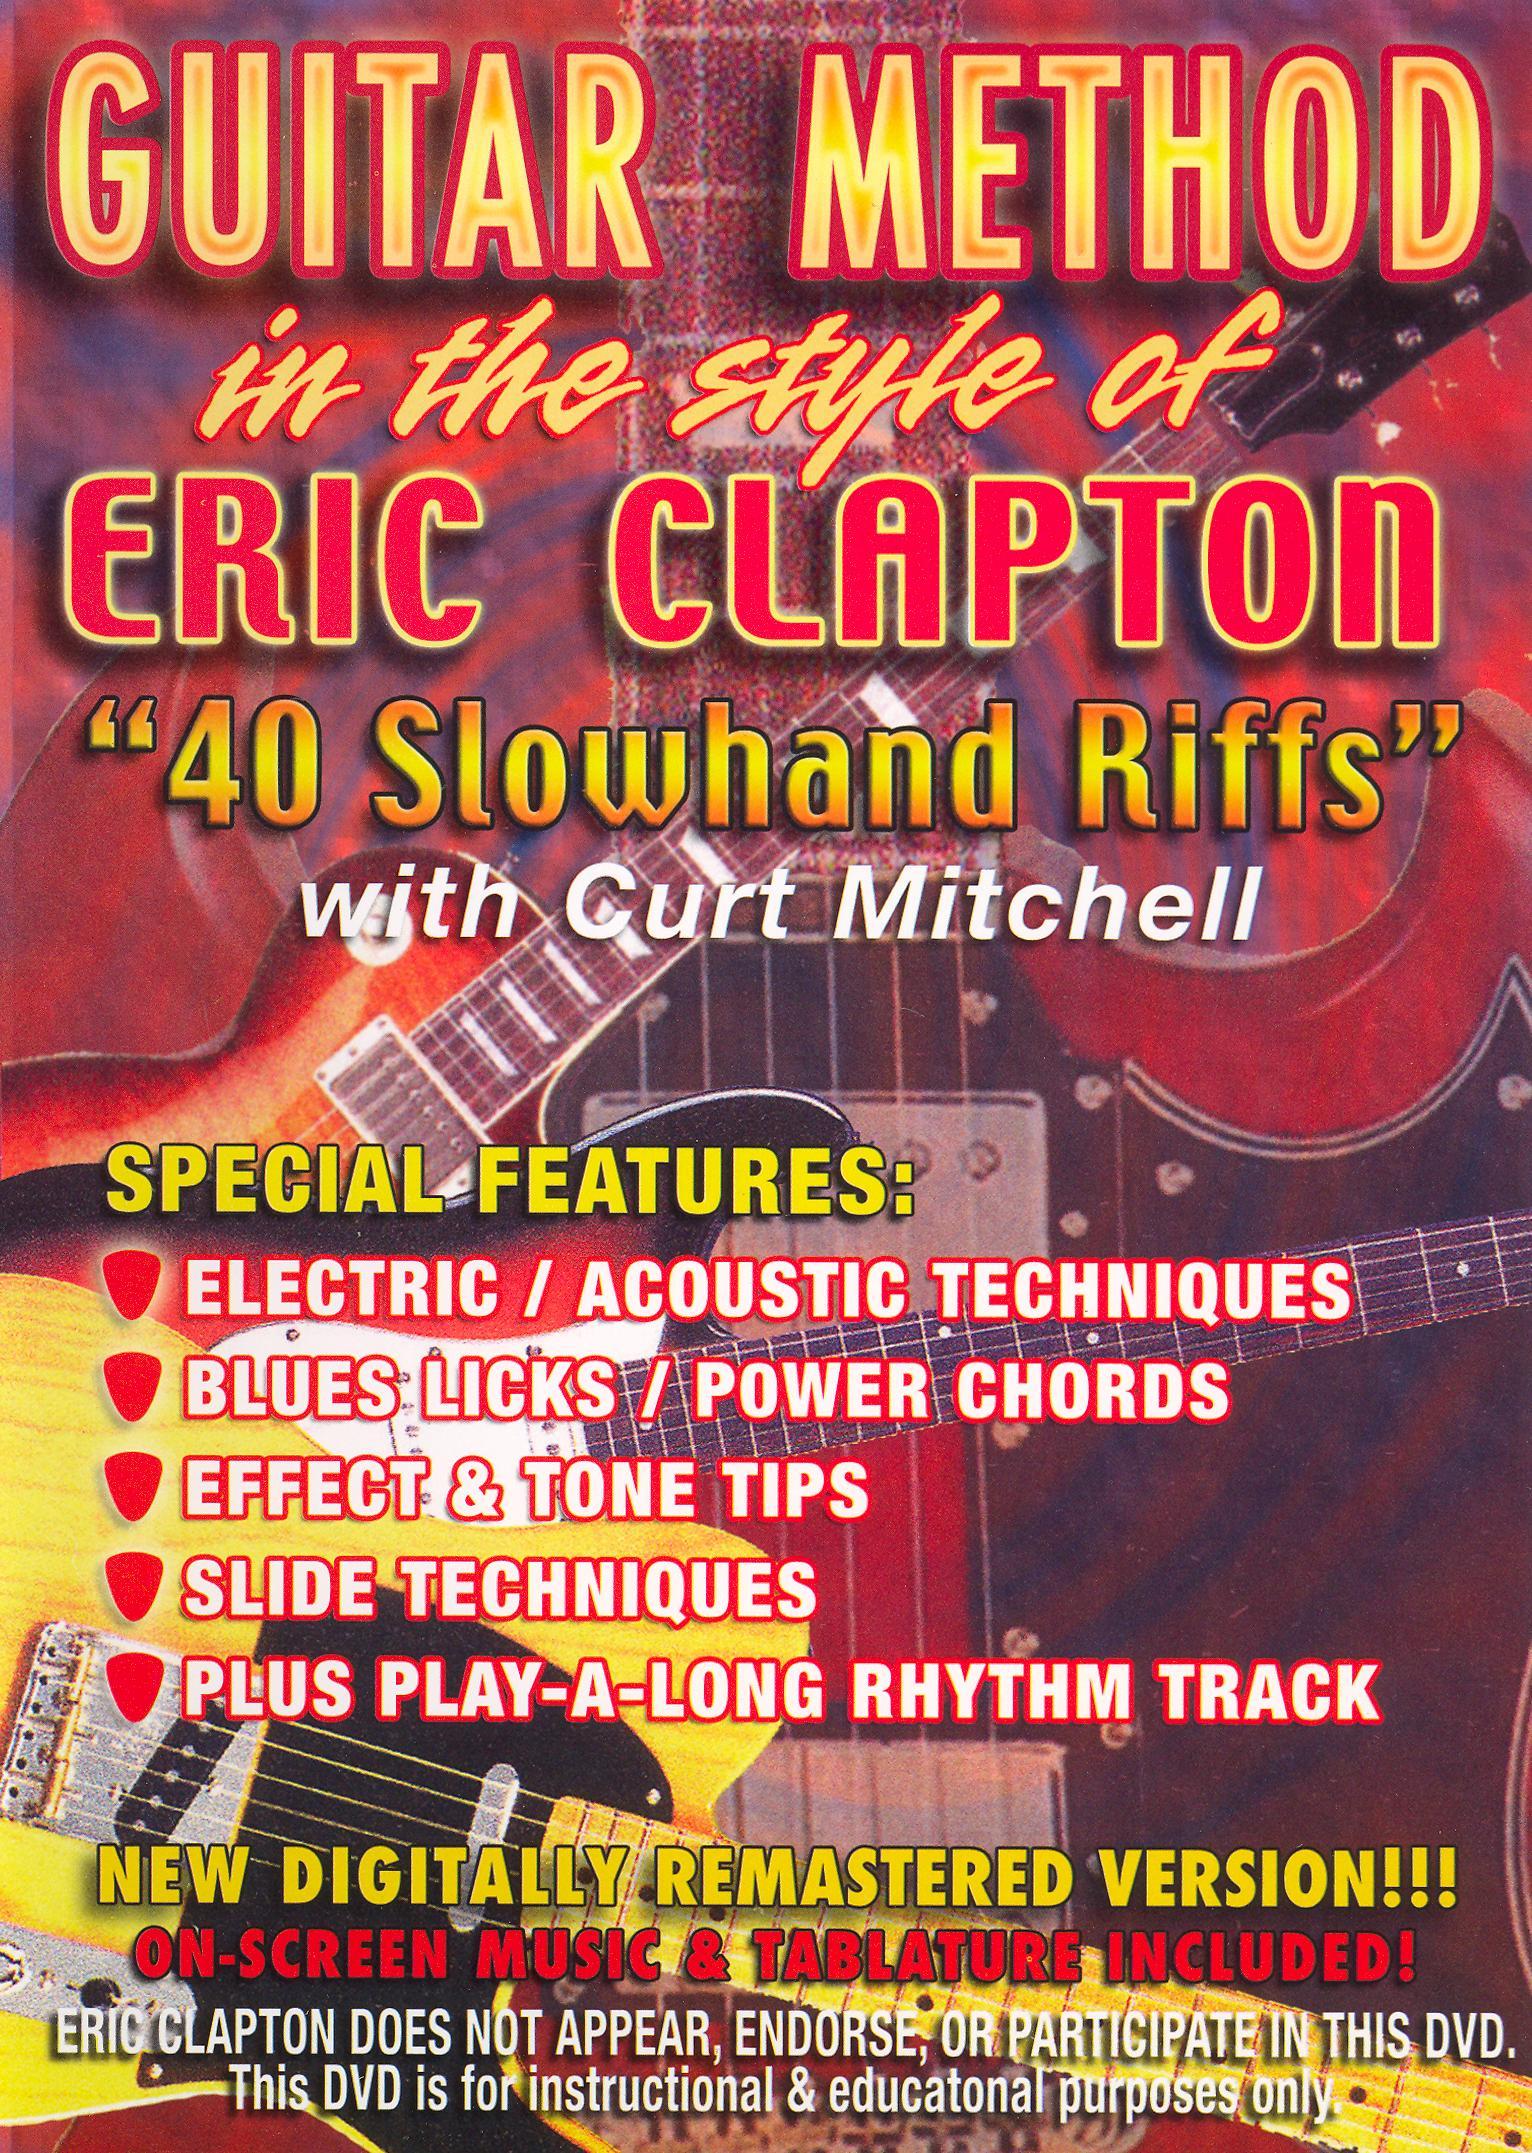 Guitar Method: Eric Clapton - 40 Slowhand Riffs